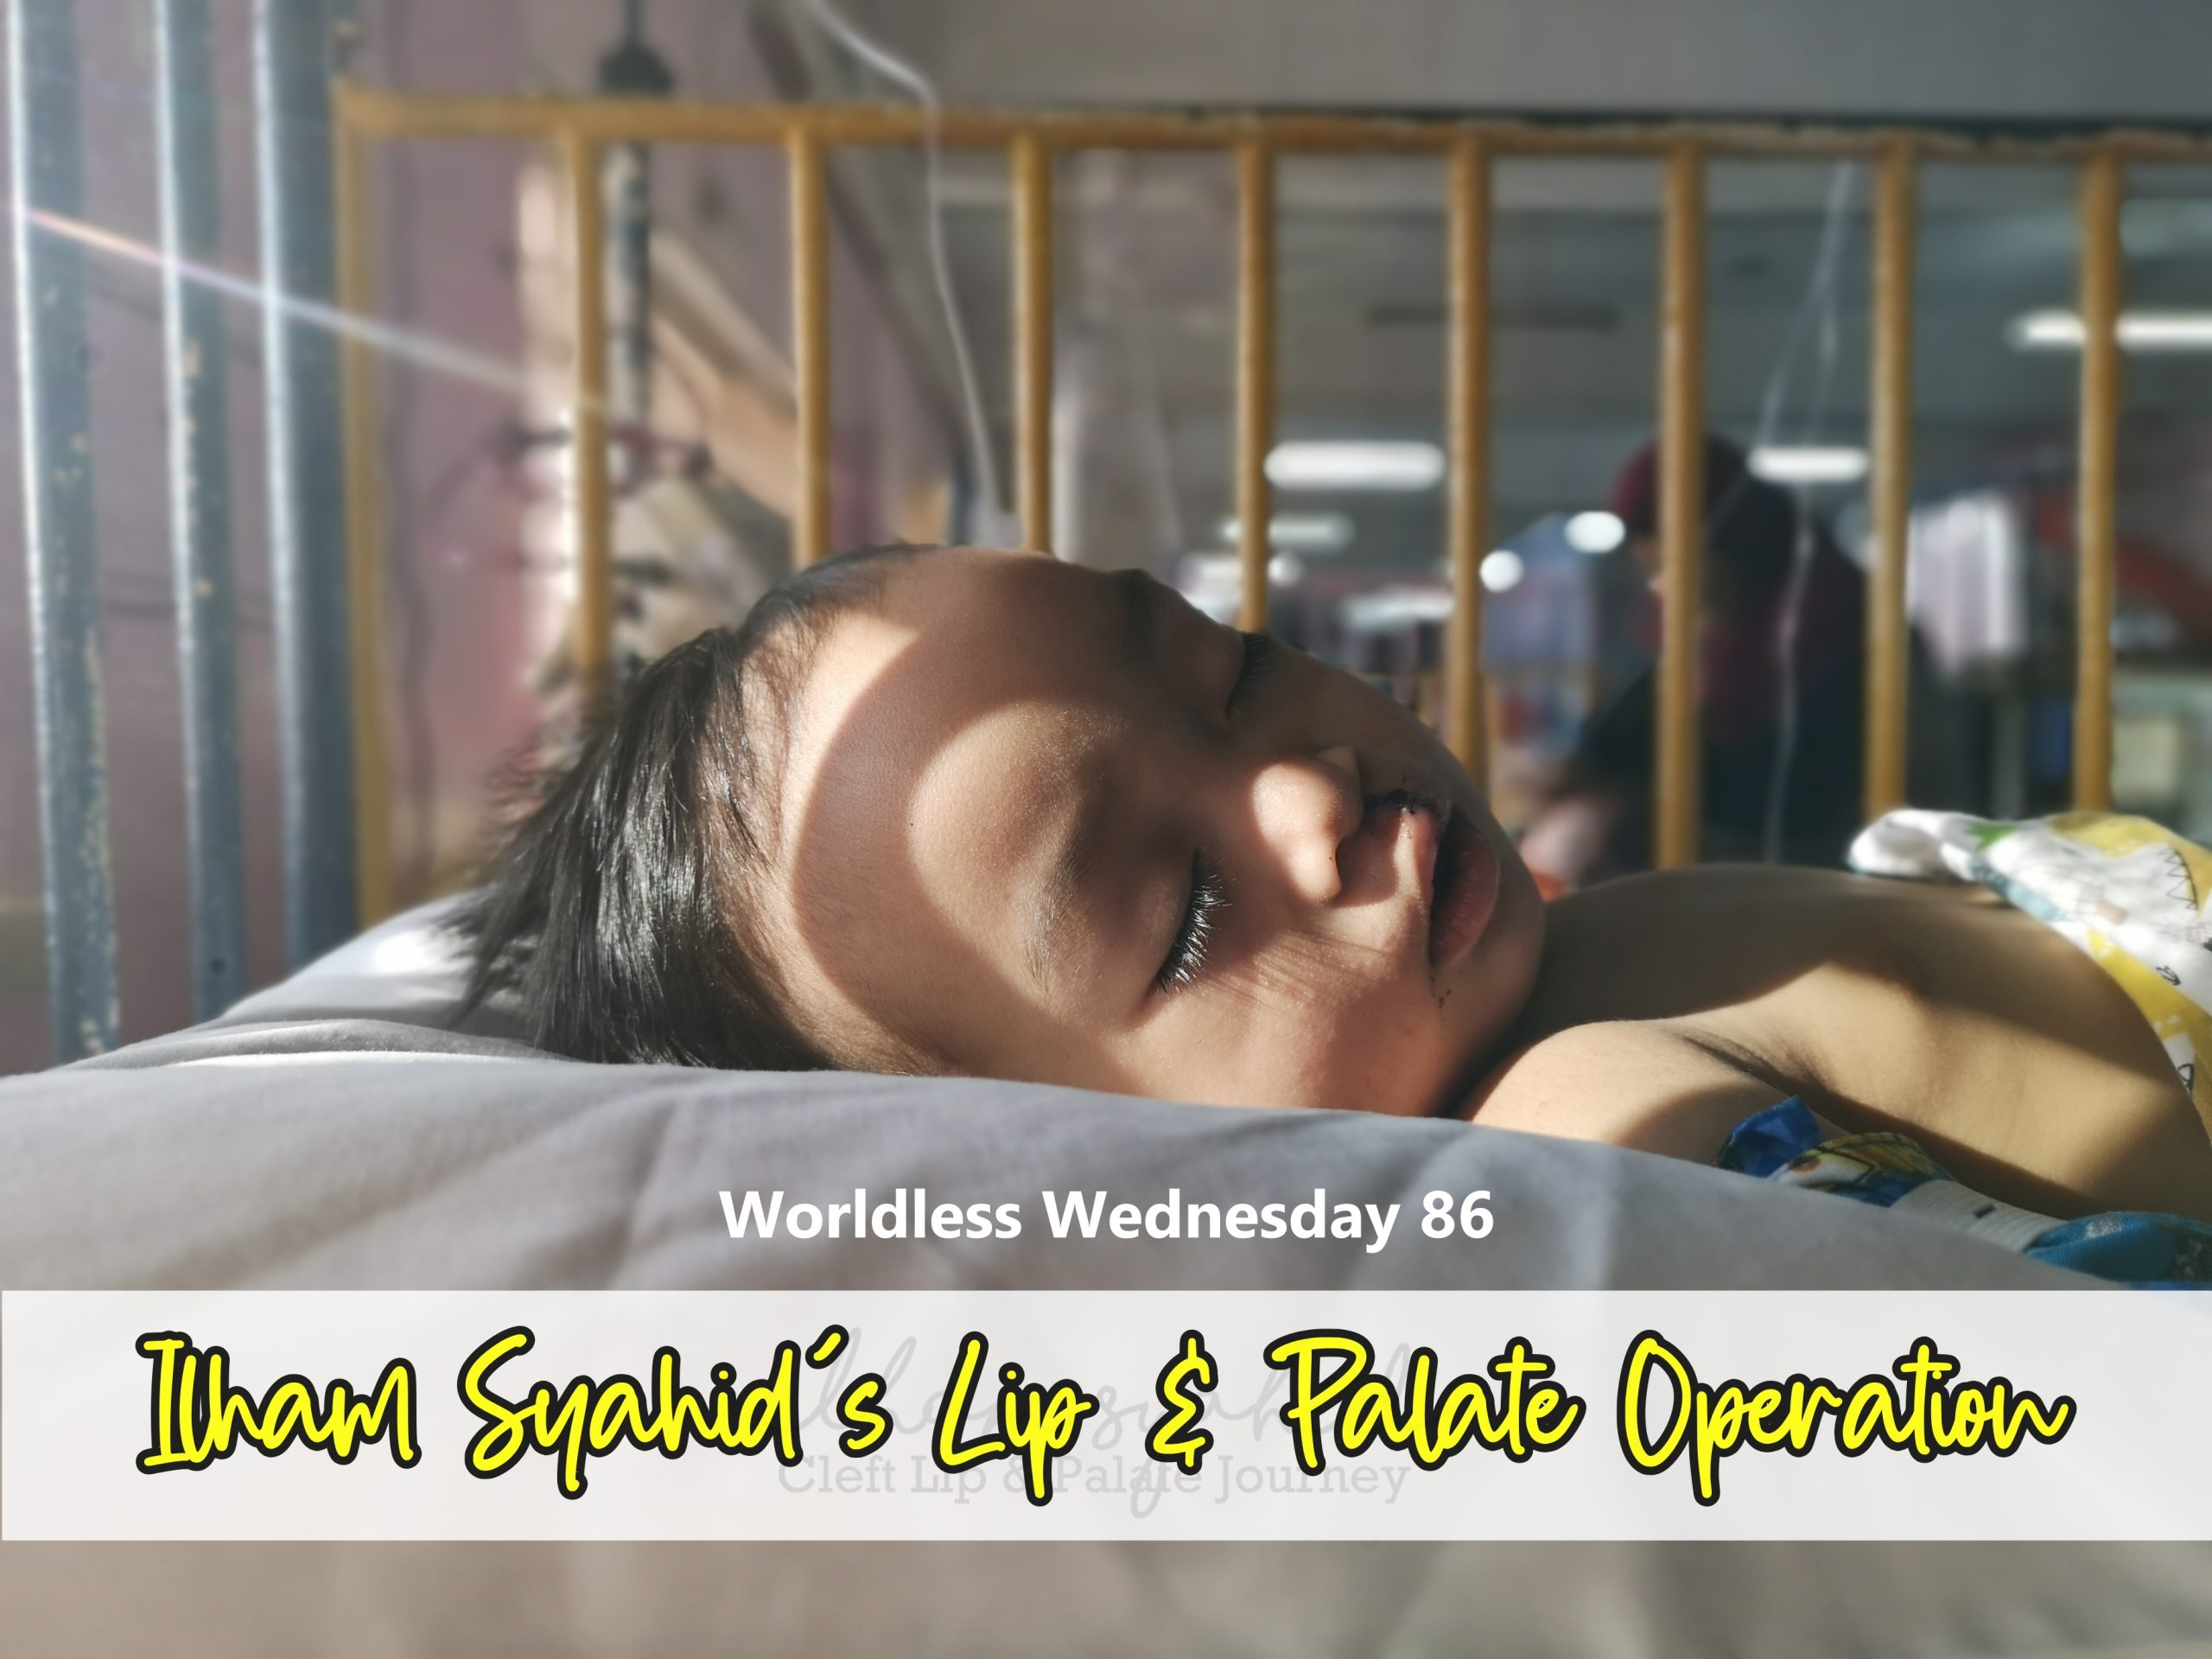 Wordless Wednesday 86 - Ilham Syahid's Lip & Palate Operation